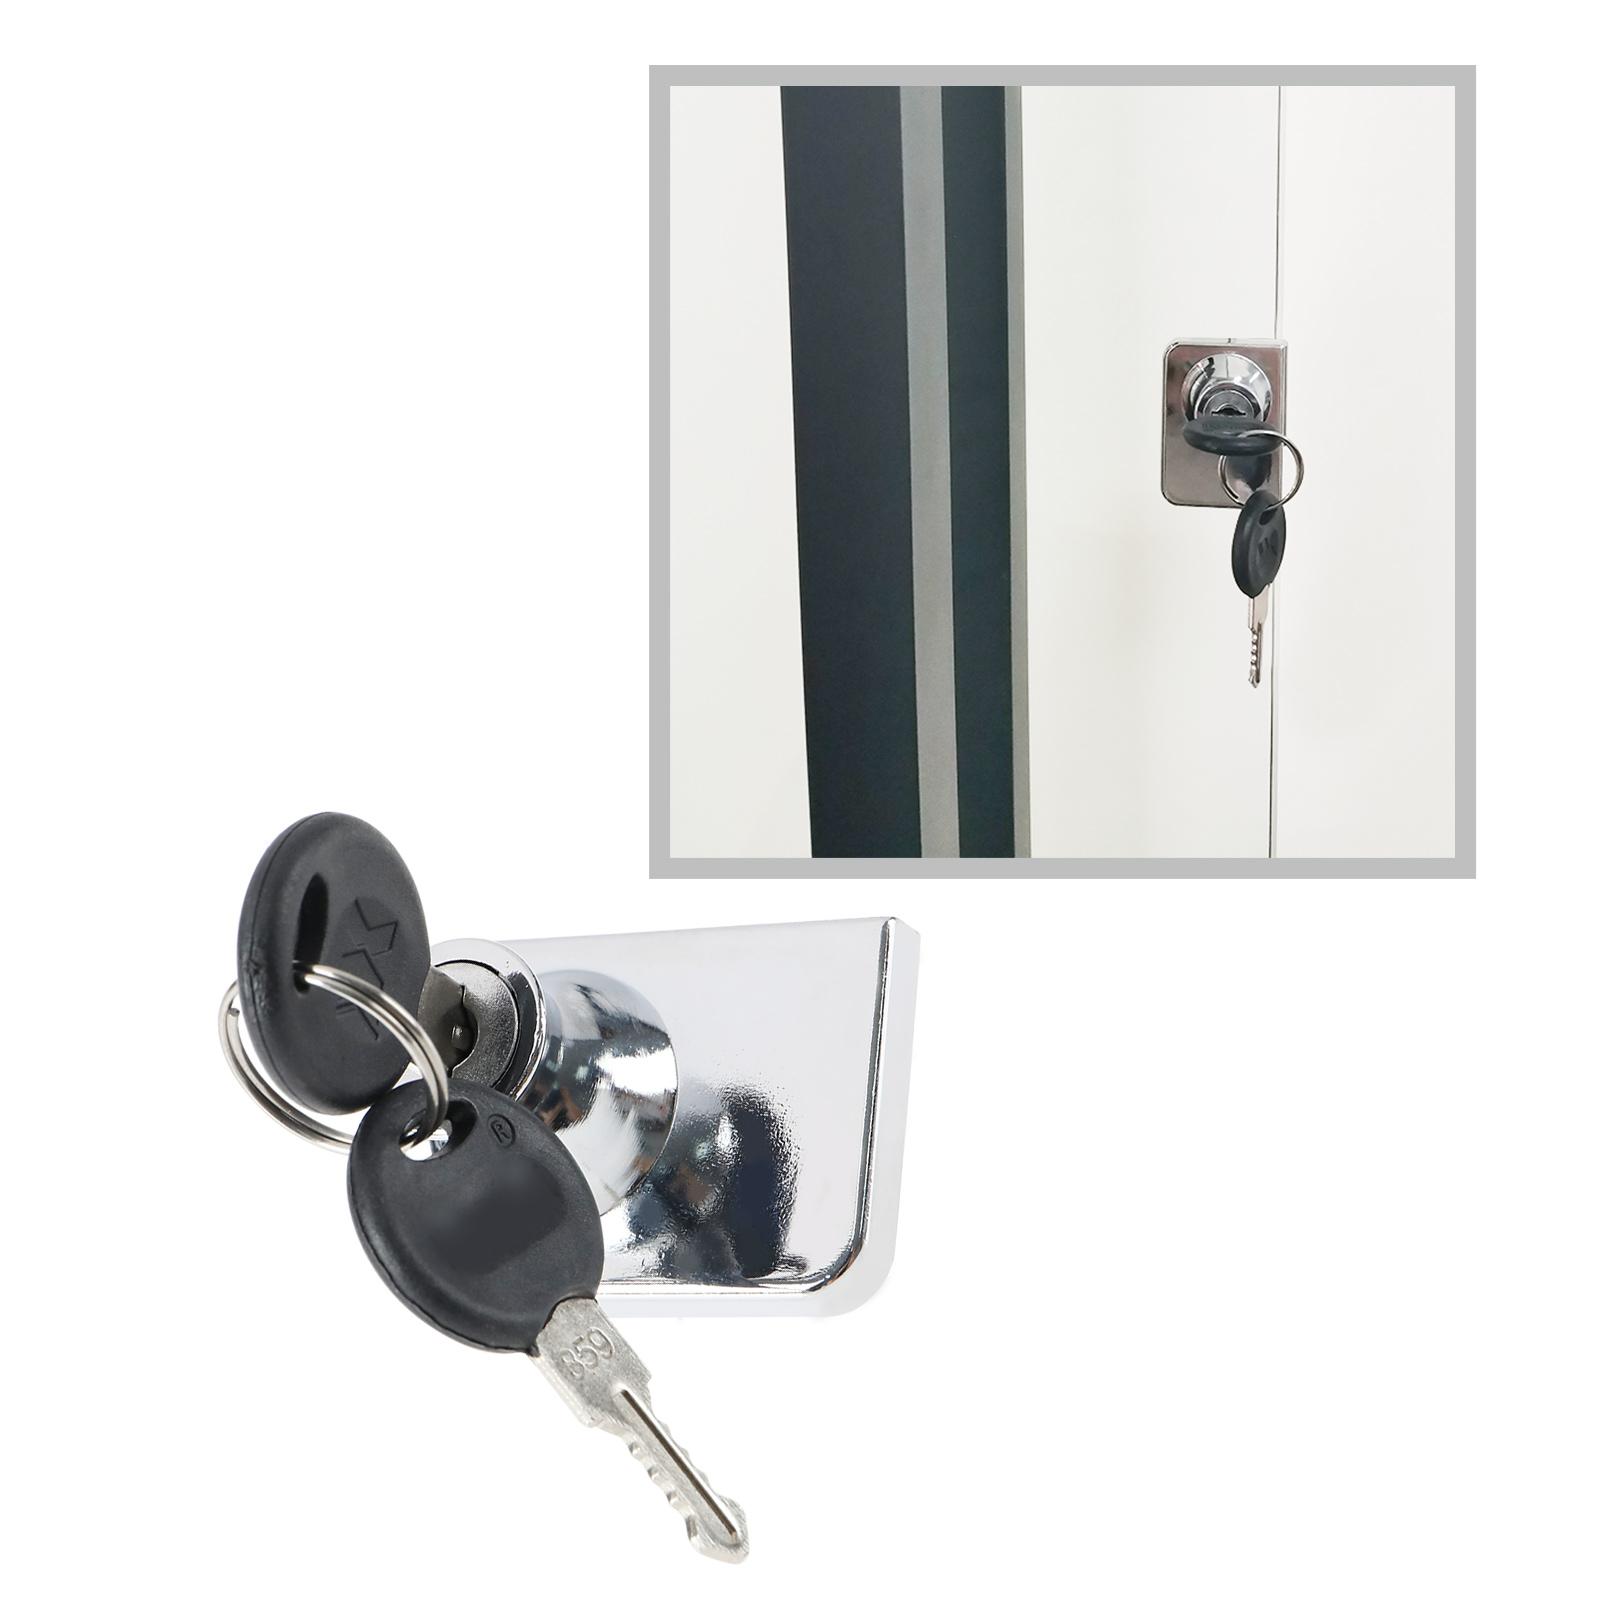 Glass Cabinet Lock for IKEA Detolf Argos Display Model Display ...